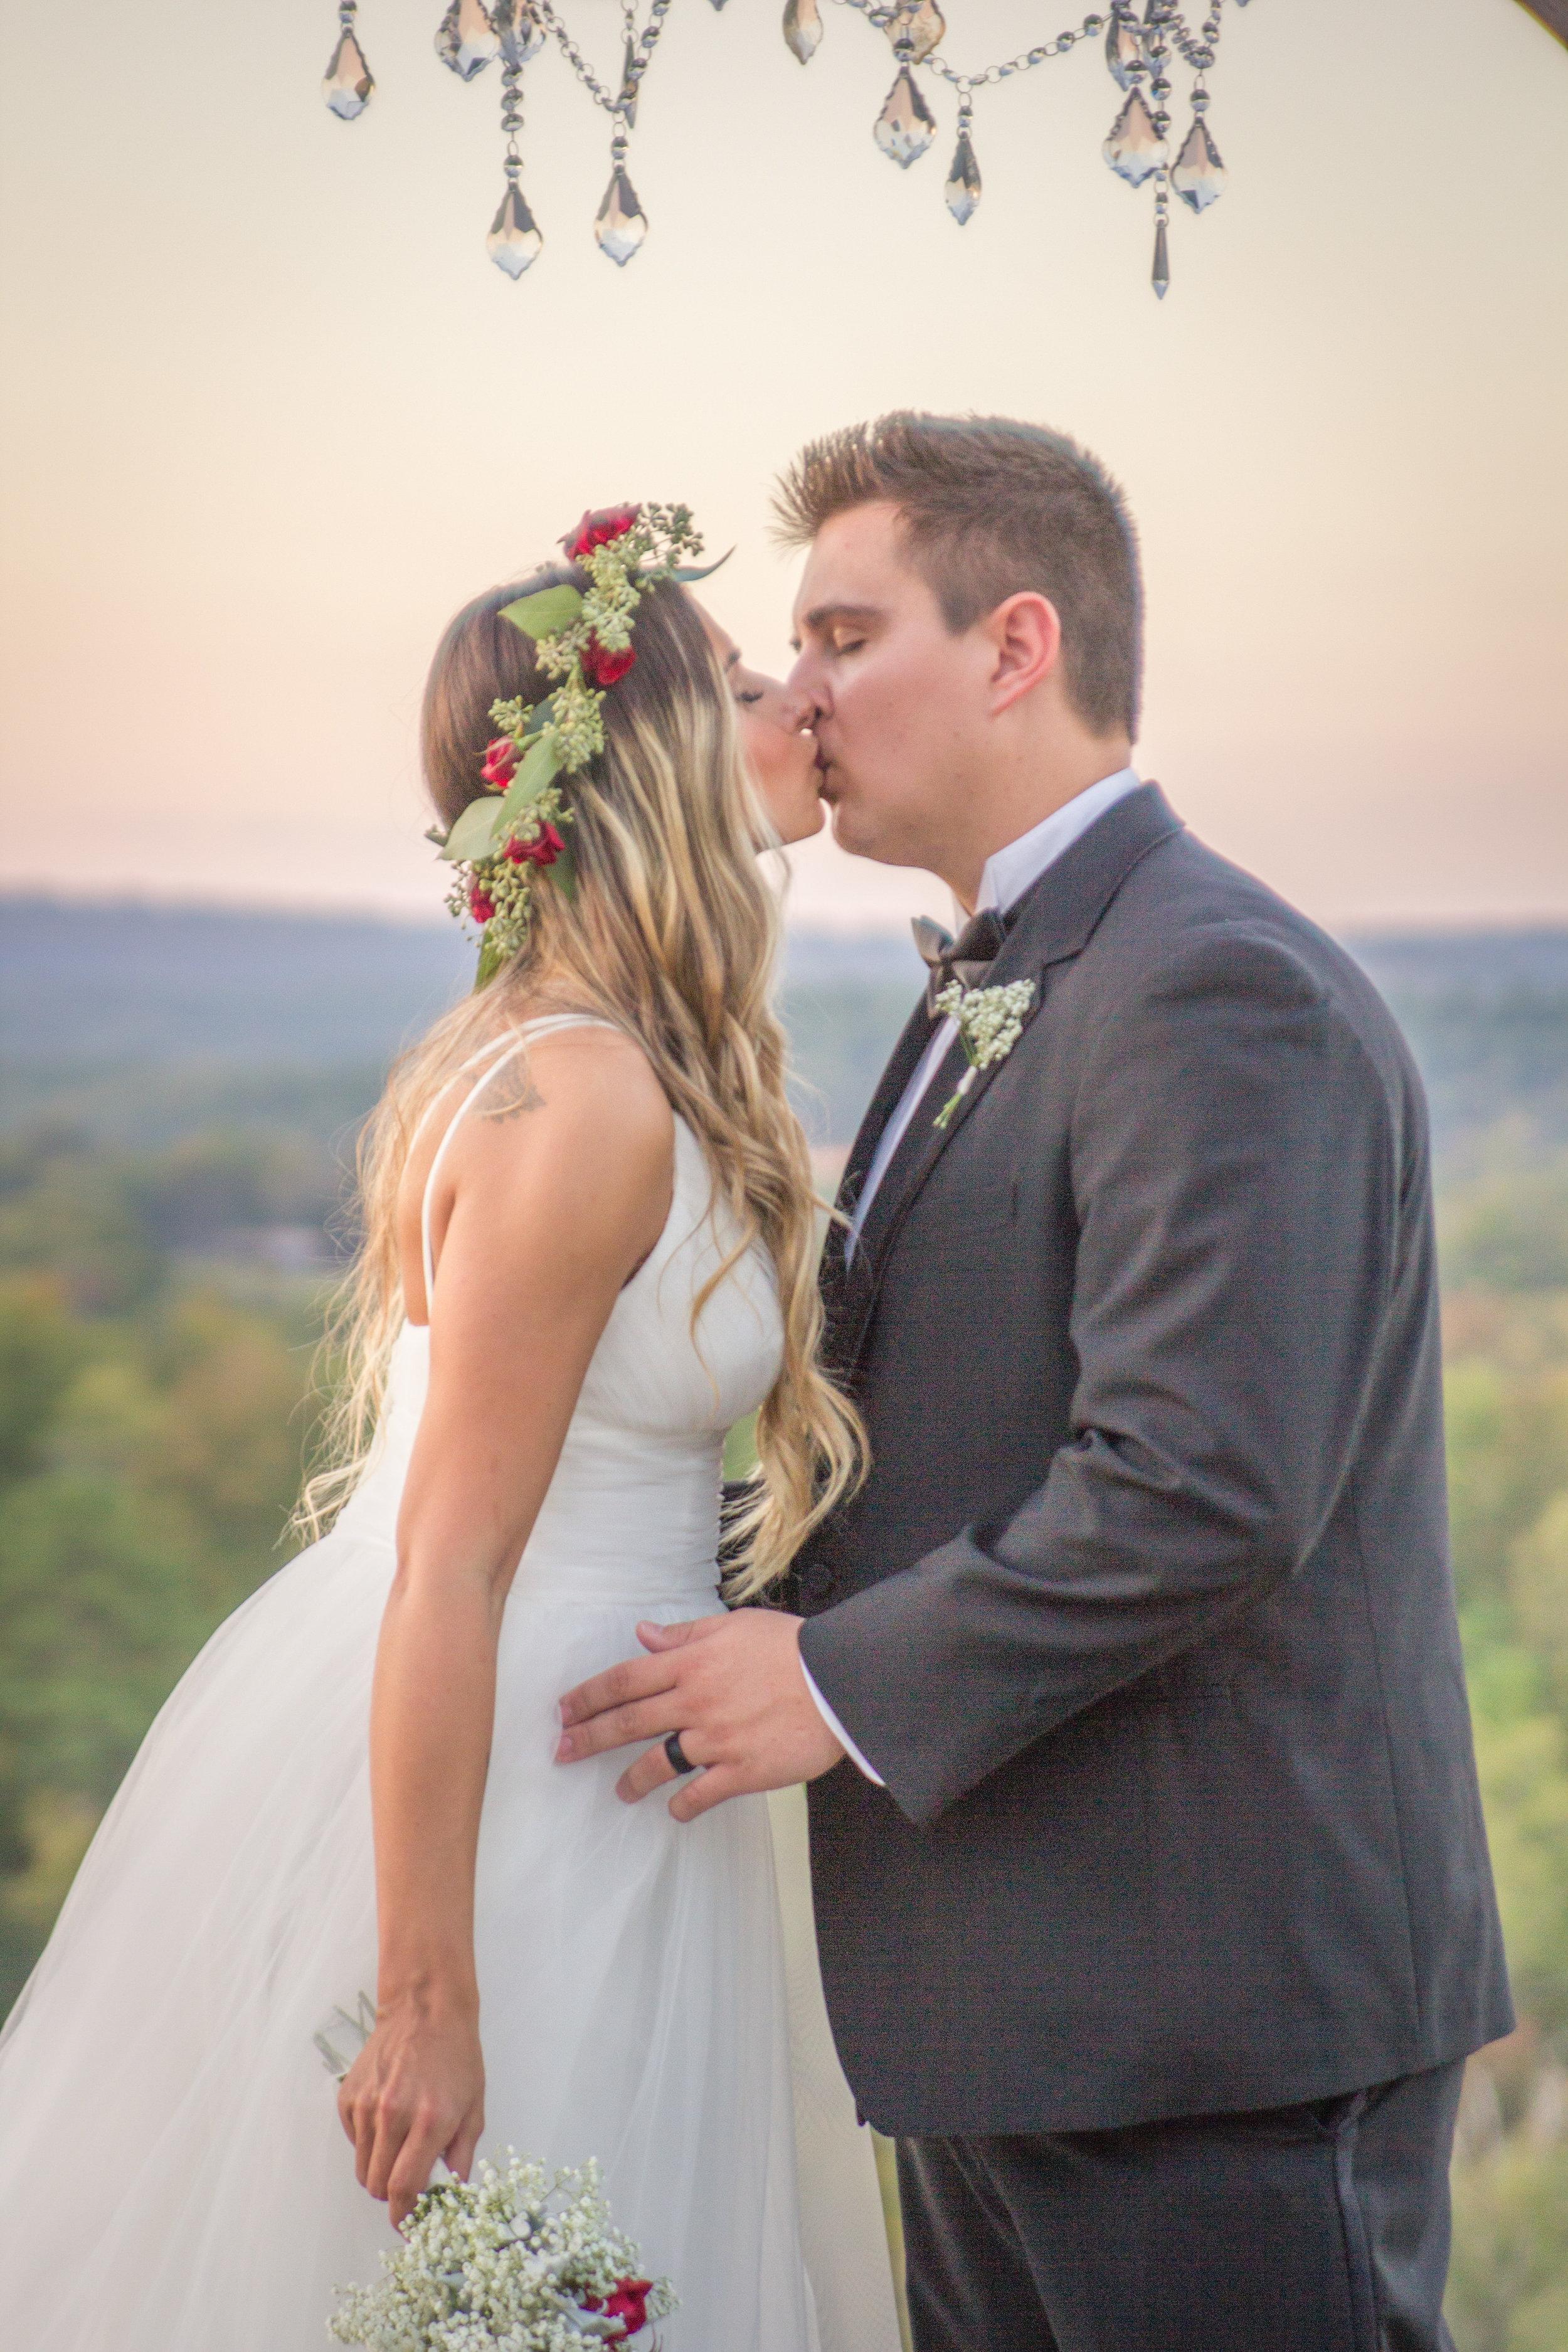 Hannah_Capps_Photography_Arkansas_Royal_Ridge_Gold_Wedding93.jpg